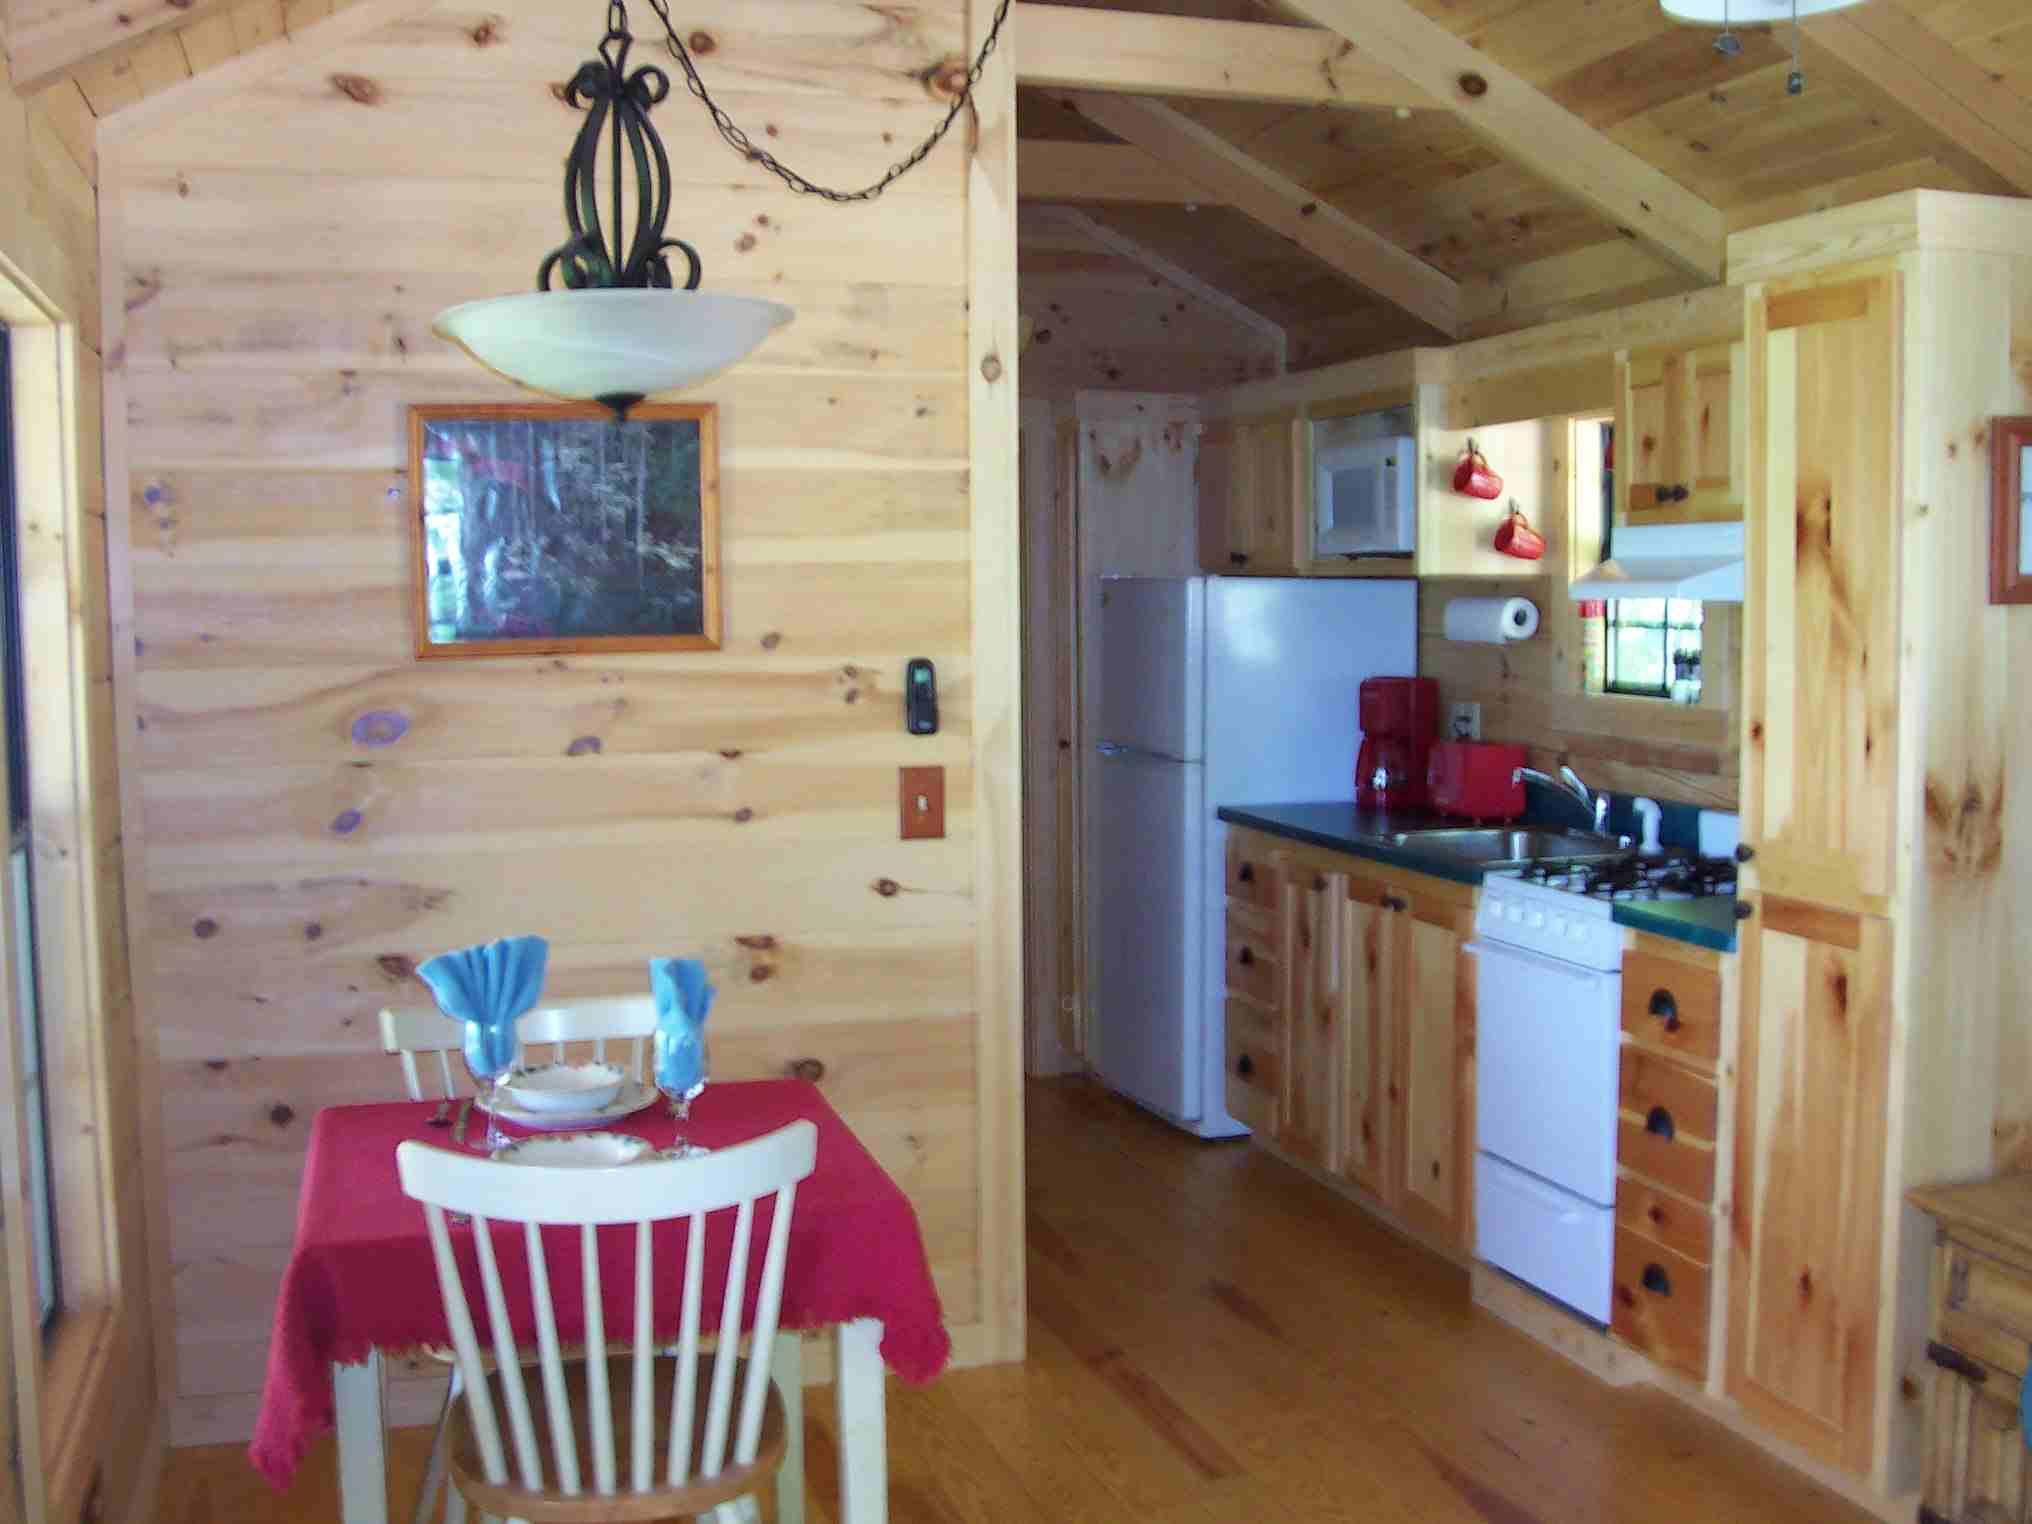 living weddings inglenook family reunions htm oakland carolina cabin nc north reunion rentals asheville kitchen cabins